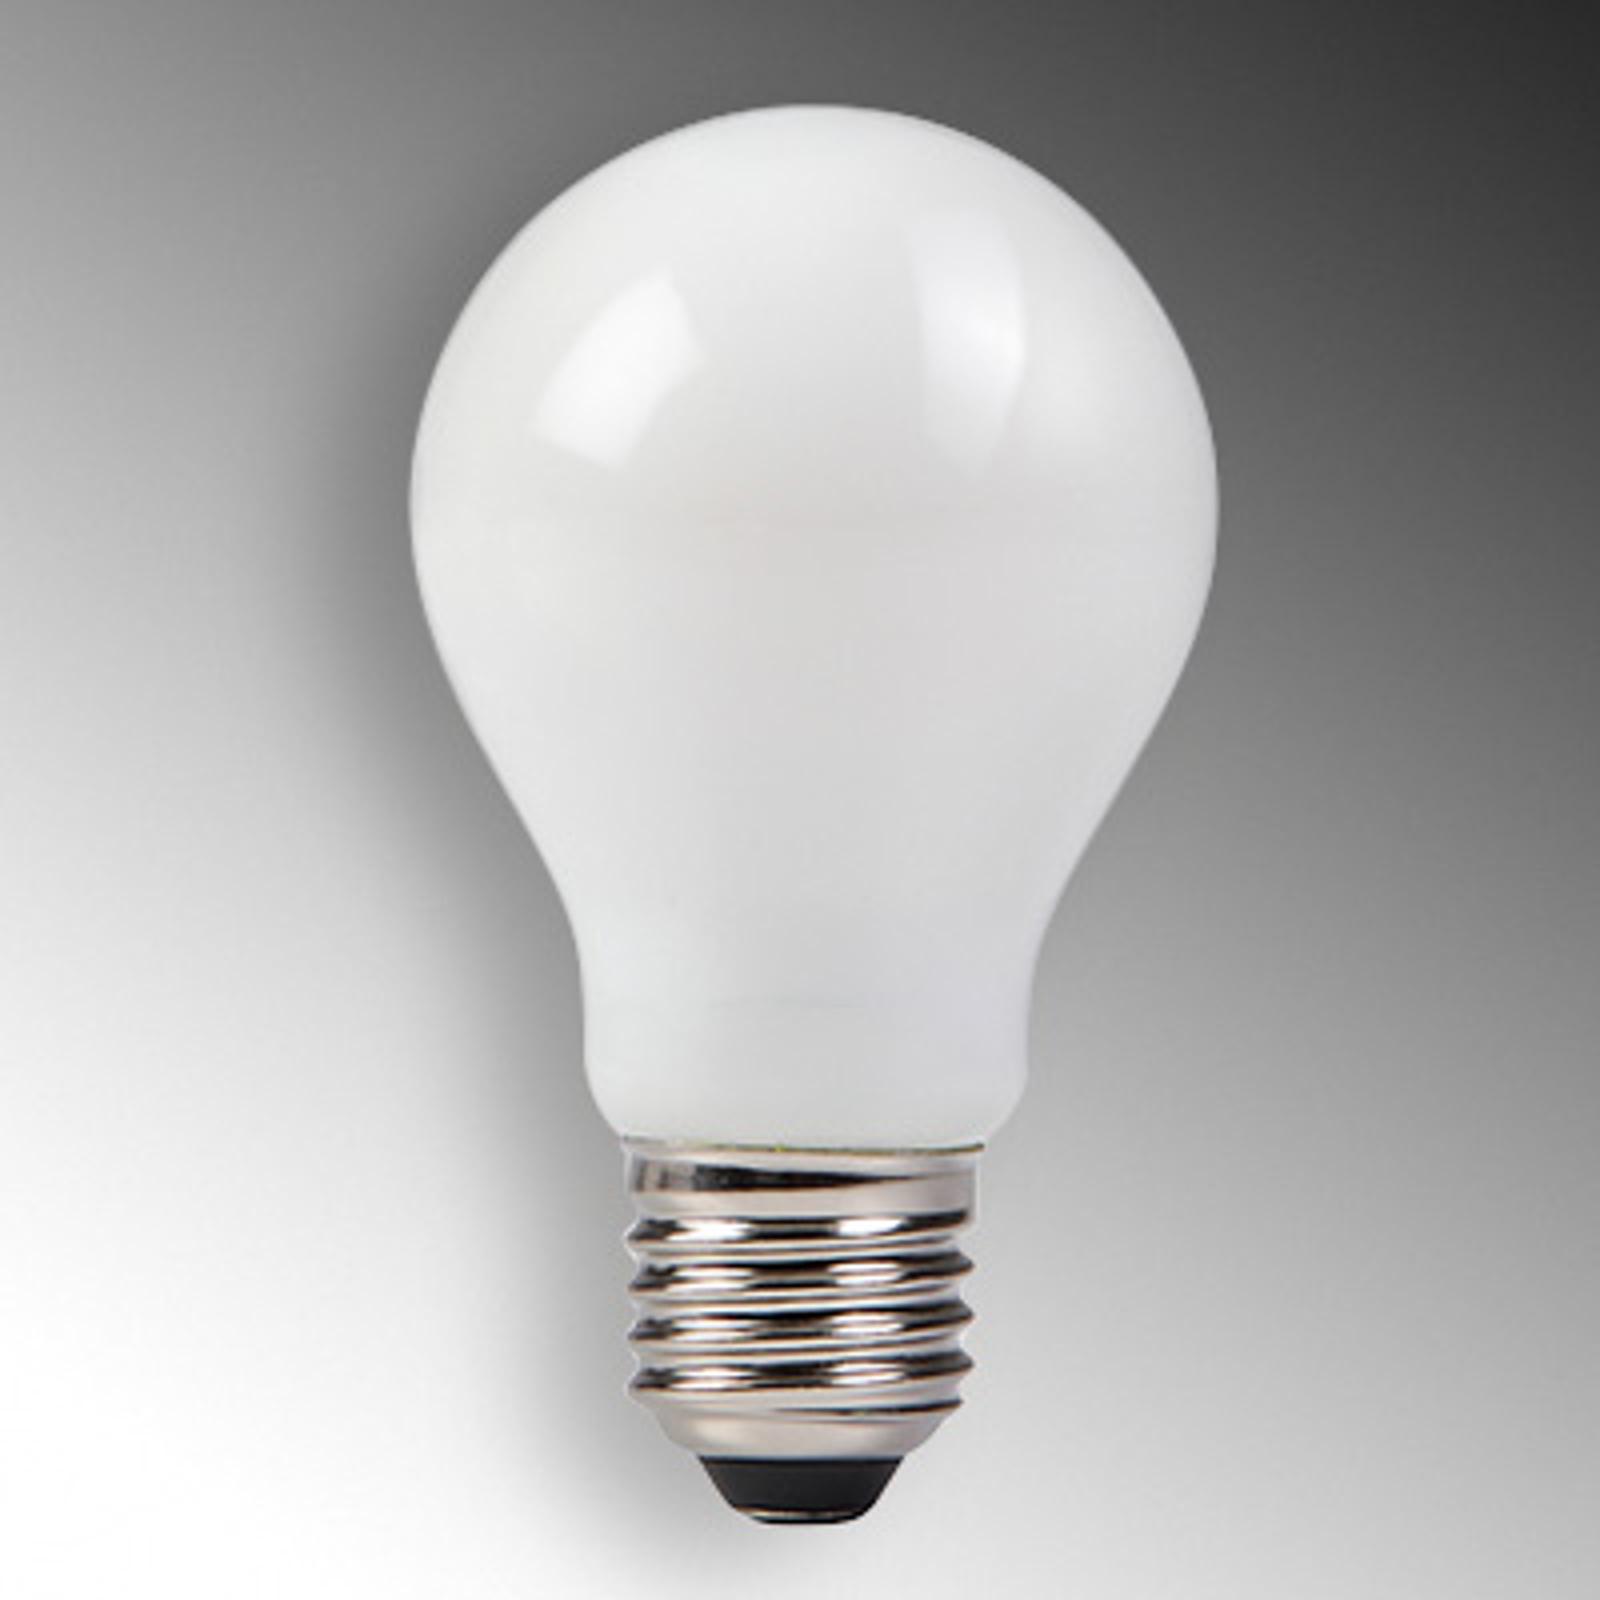 E27 4 W 827 LED bulb, satin-finished_8530164_1